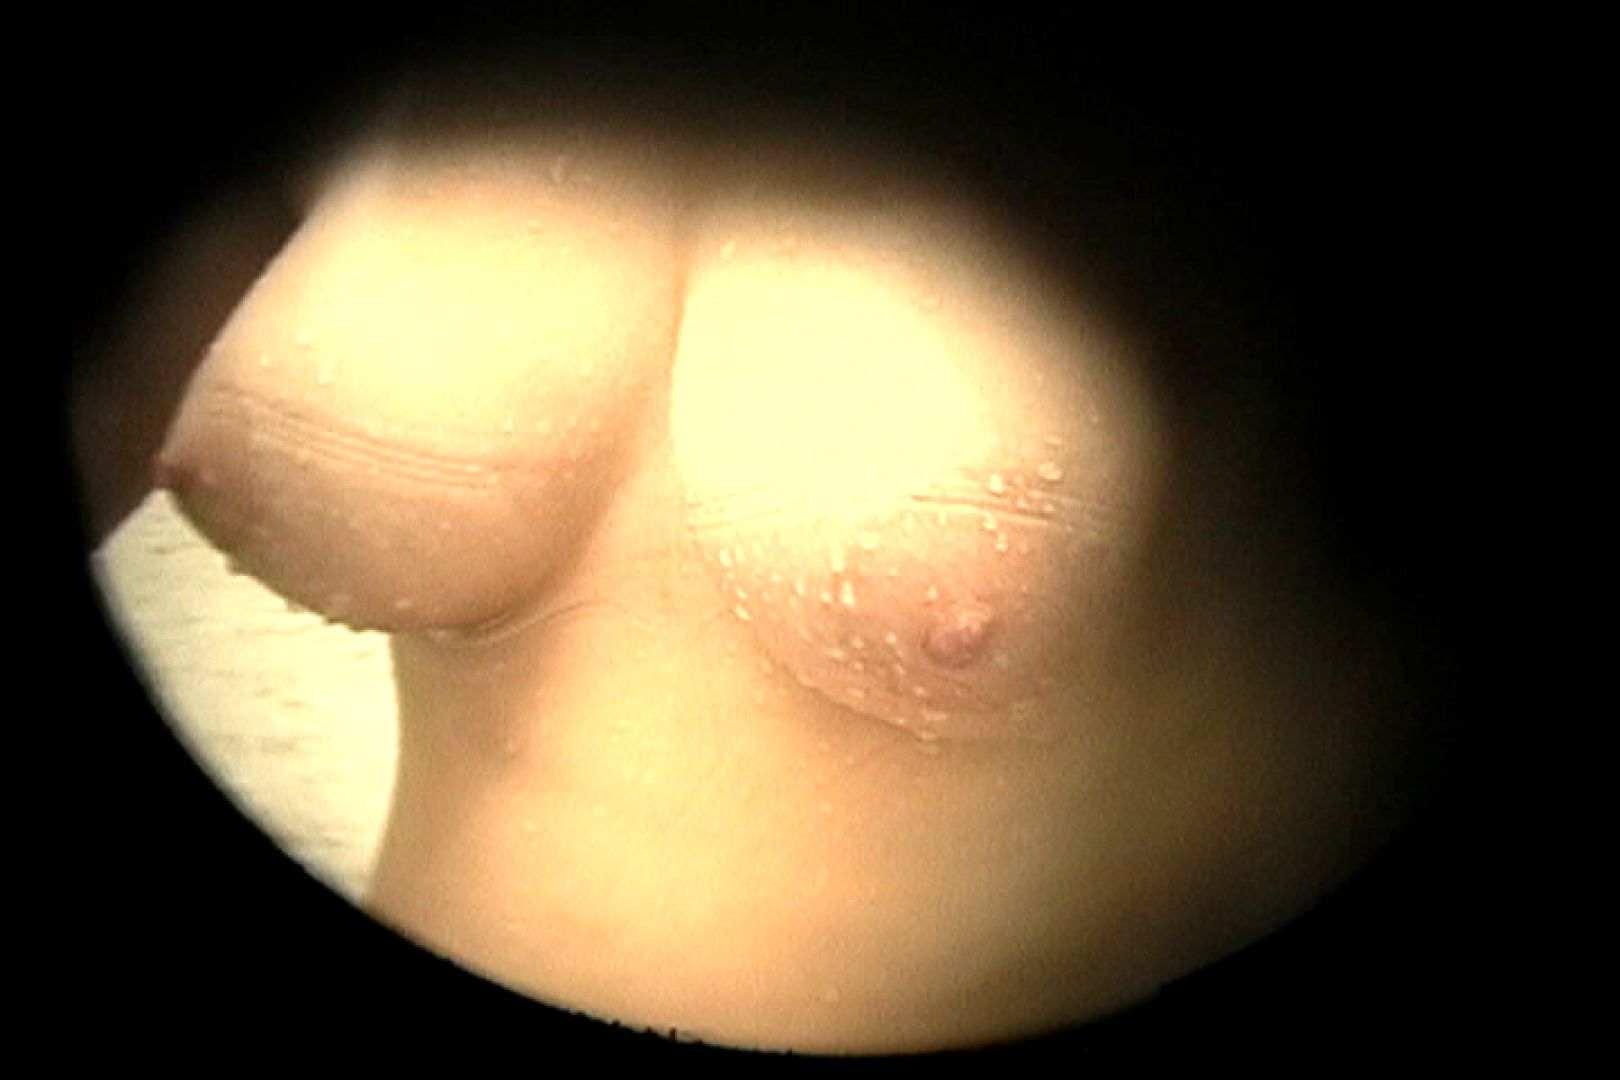 No.80 見事な巨乳にピンクの巨乳輪 巨乳 AV動画キャプチャ 38連発 14